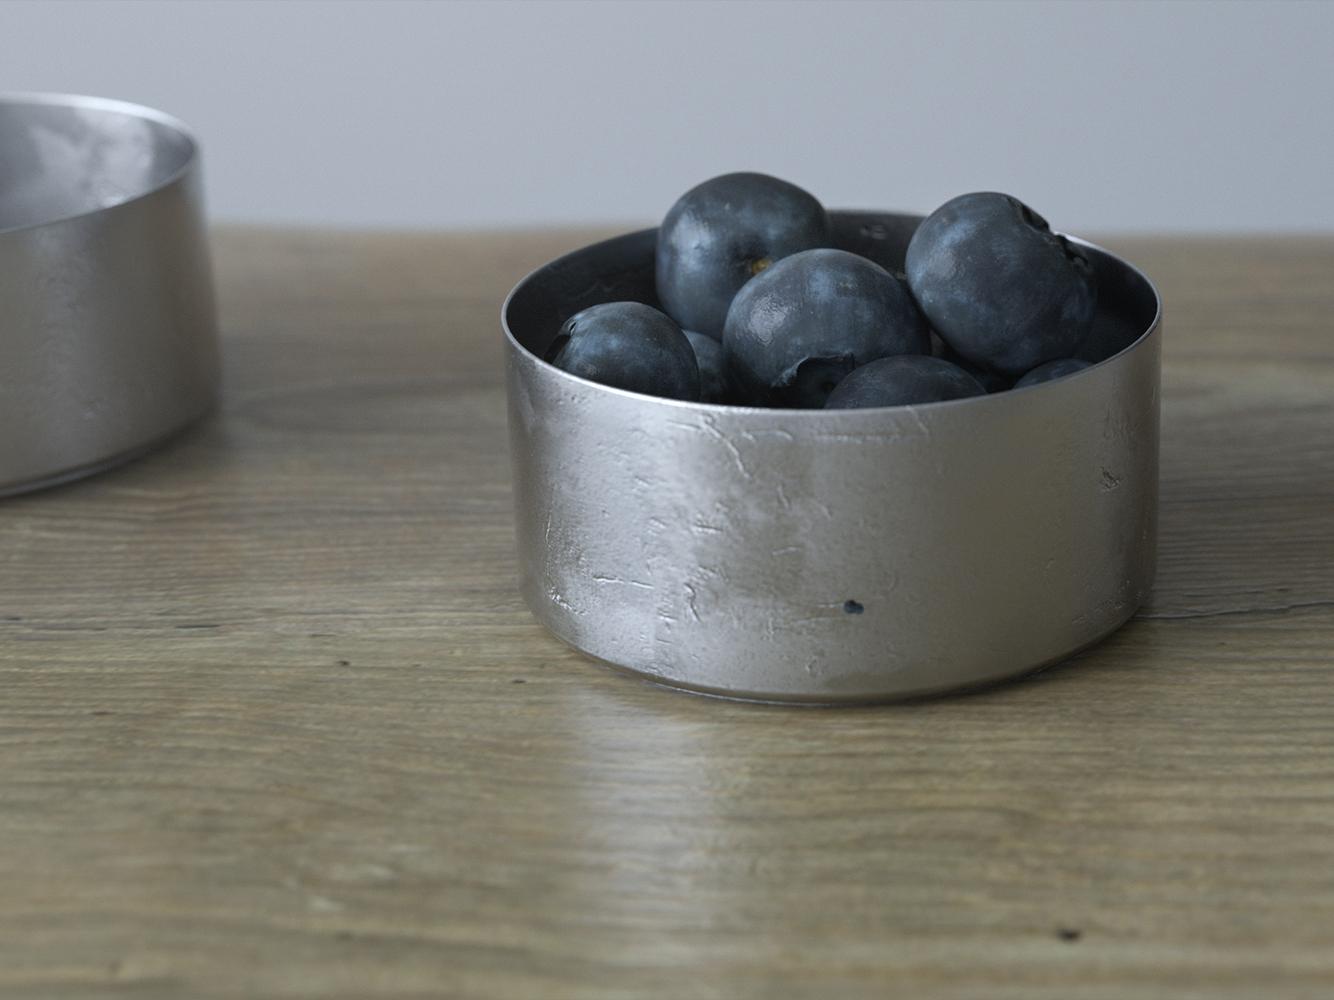 blueberry design table design desk tin blueberry camera lighting interior still life rendering realistic octane c4d 3d artist